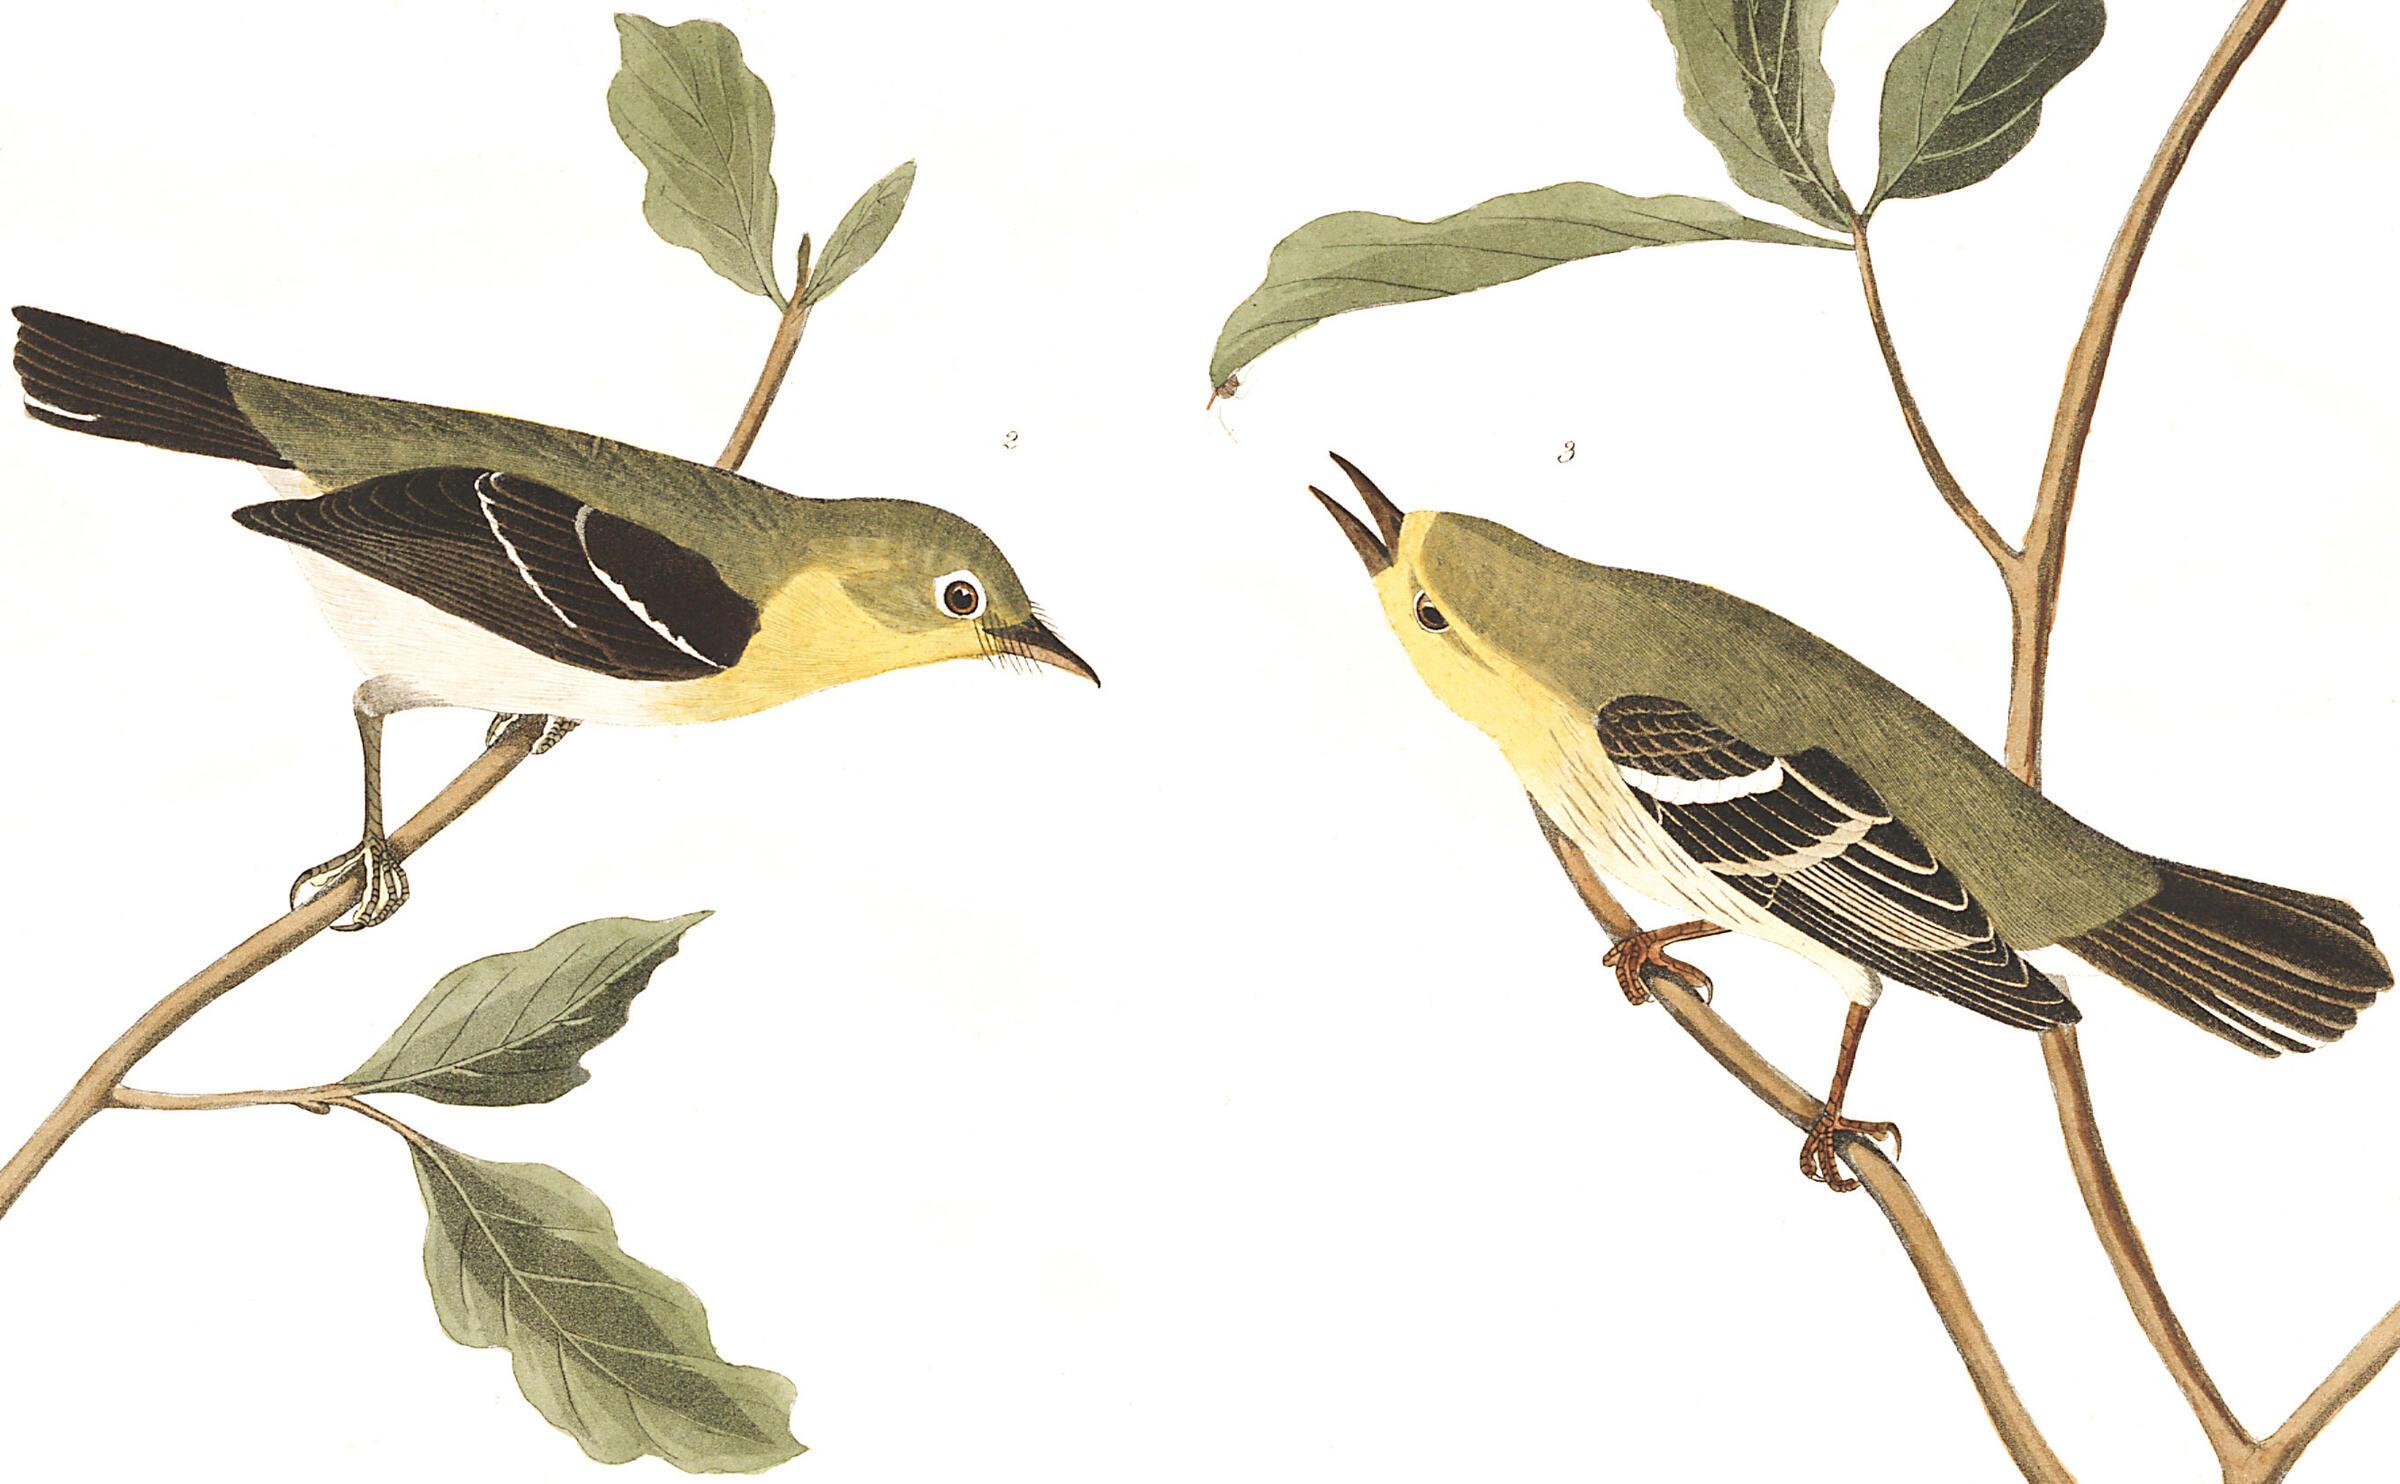 From left: Small-headed Flycatcher and Blue Mountain Warbler. Illustration: John James Audubon